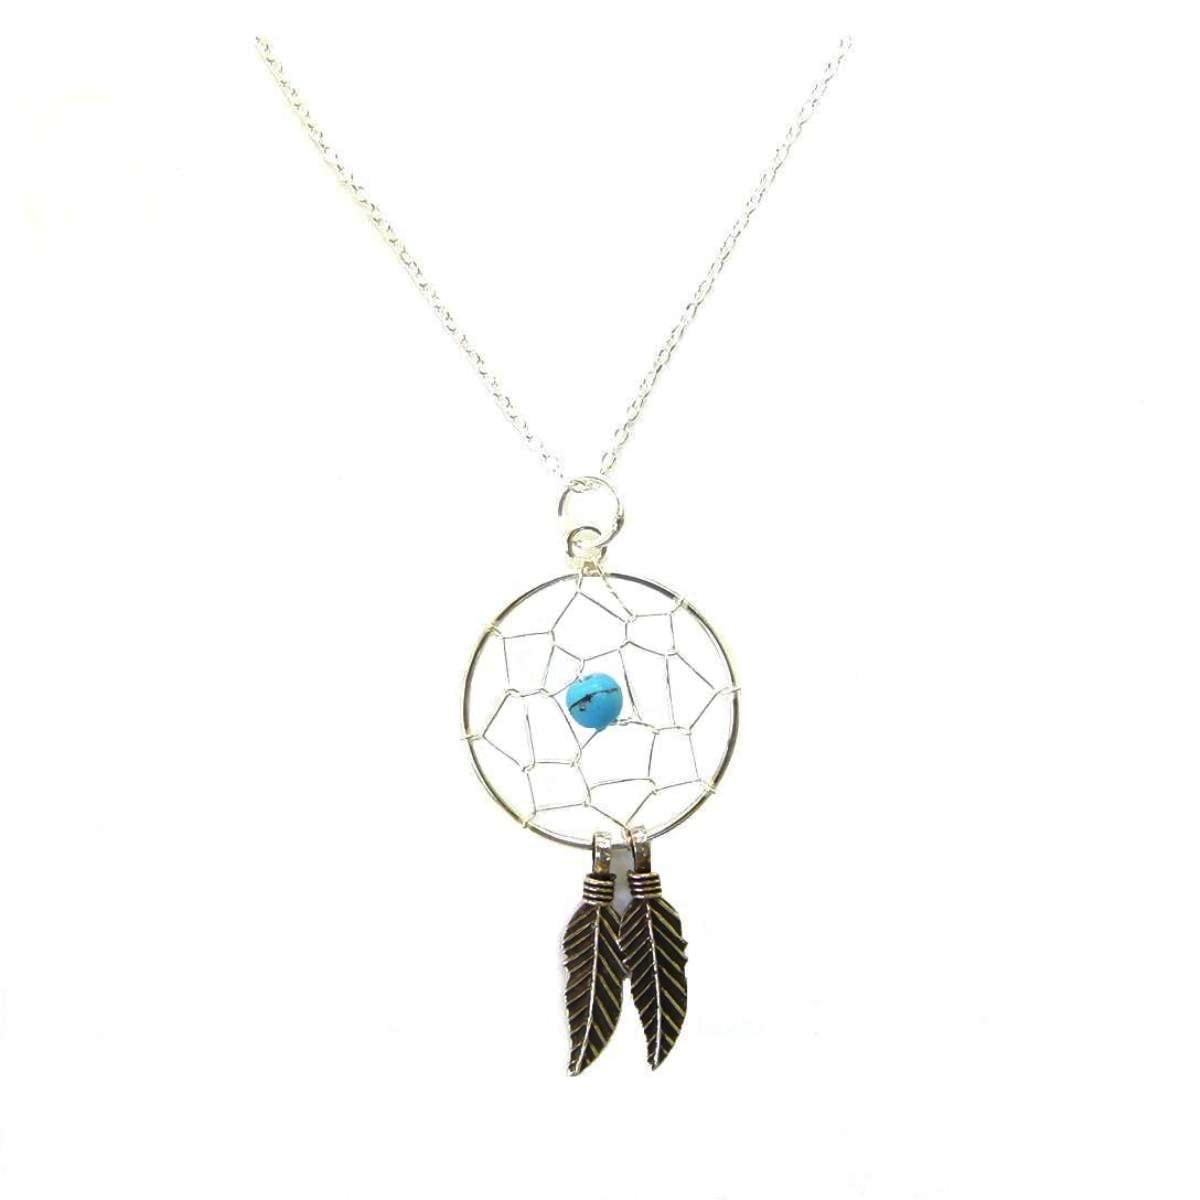 Dreamcatcher Silver Necklace.